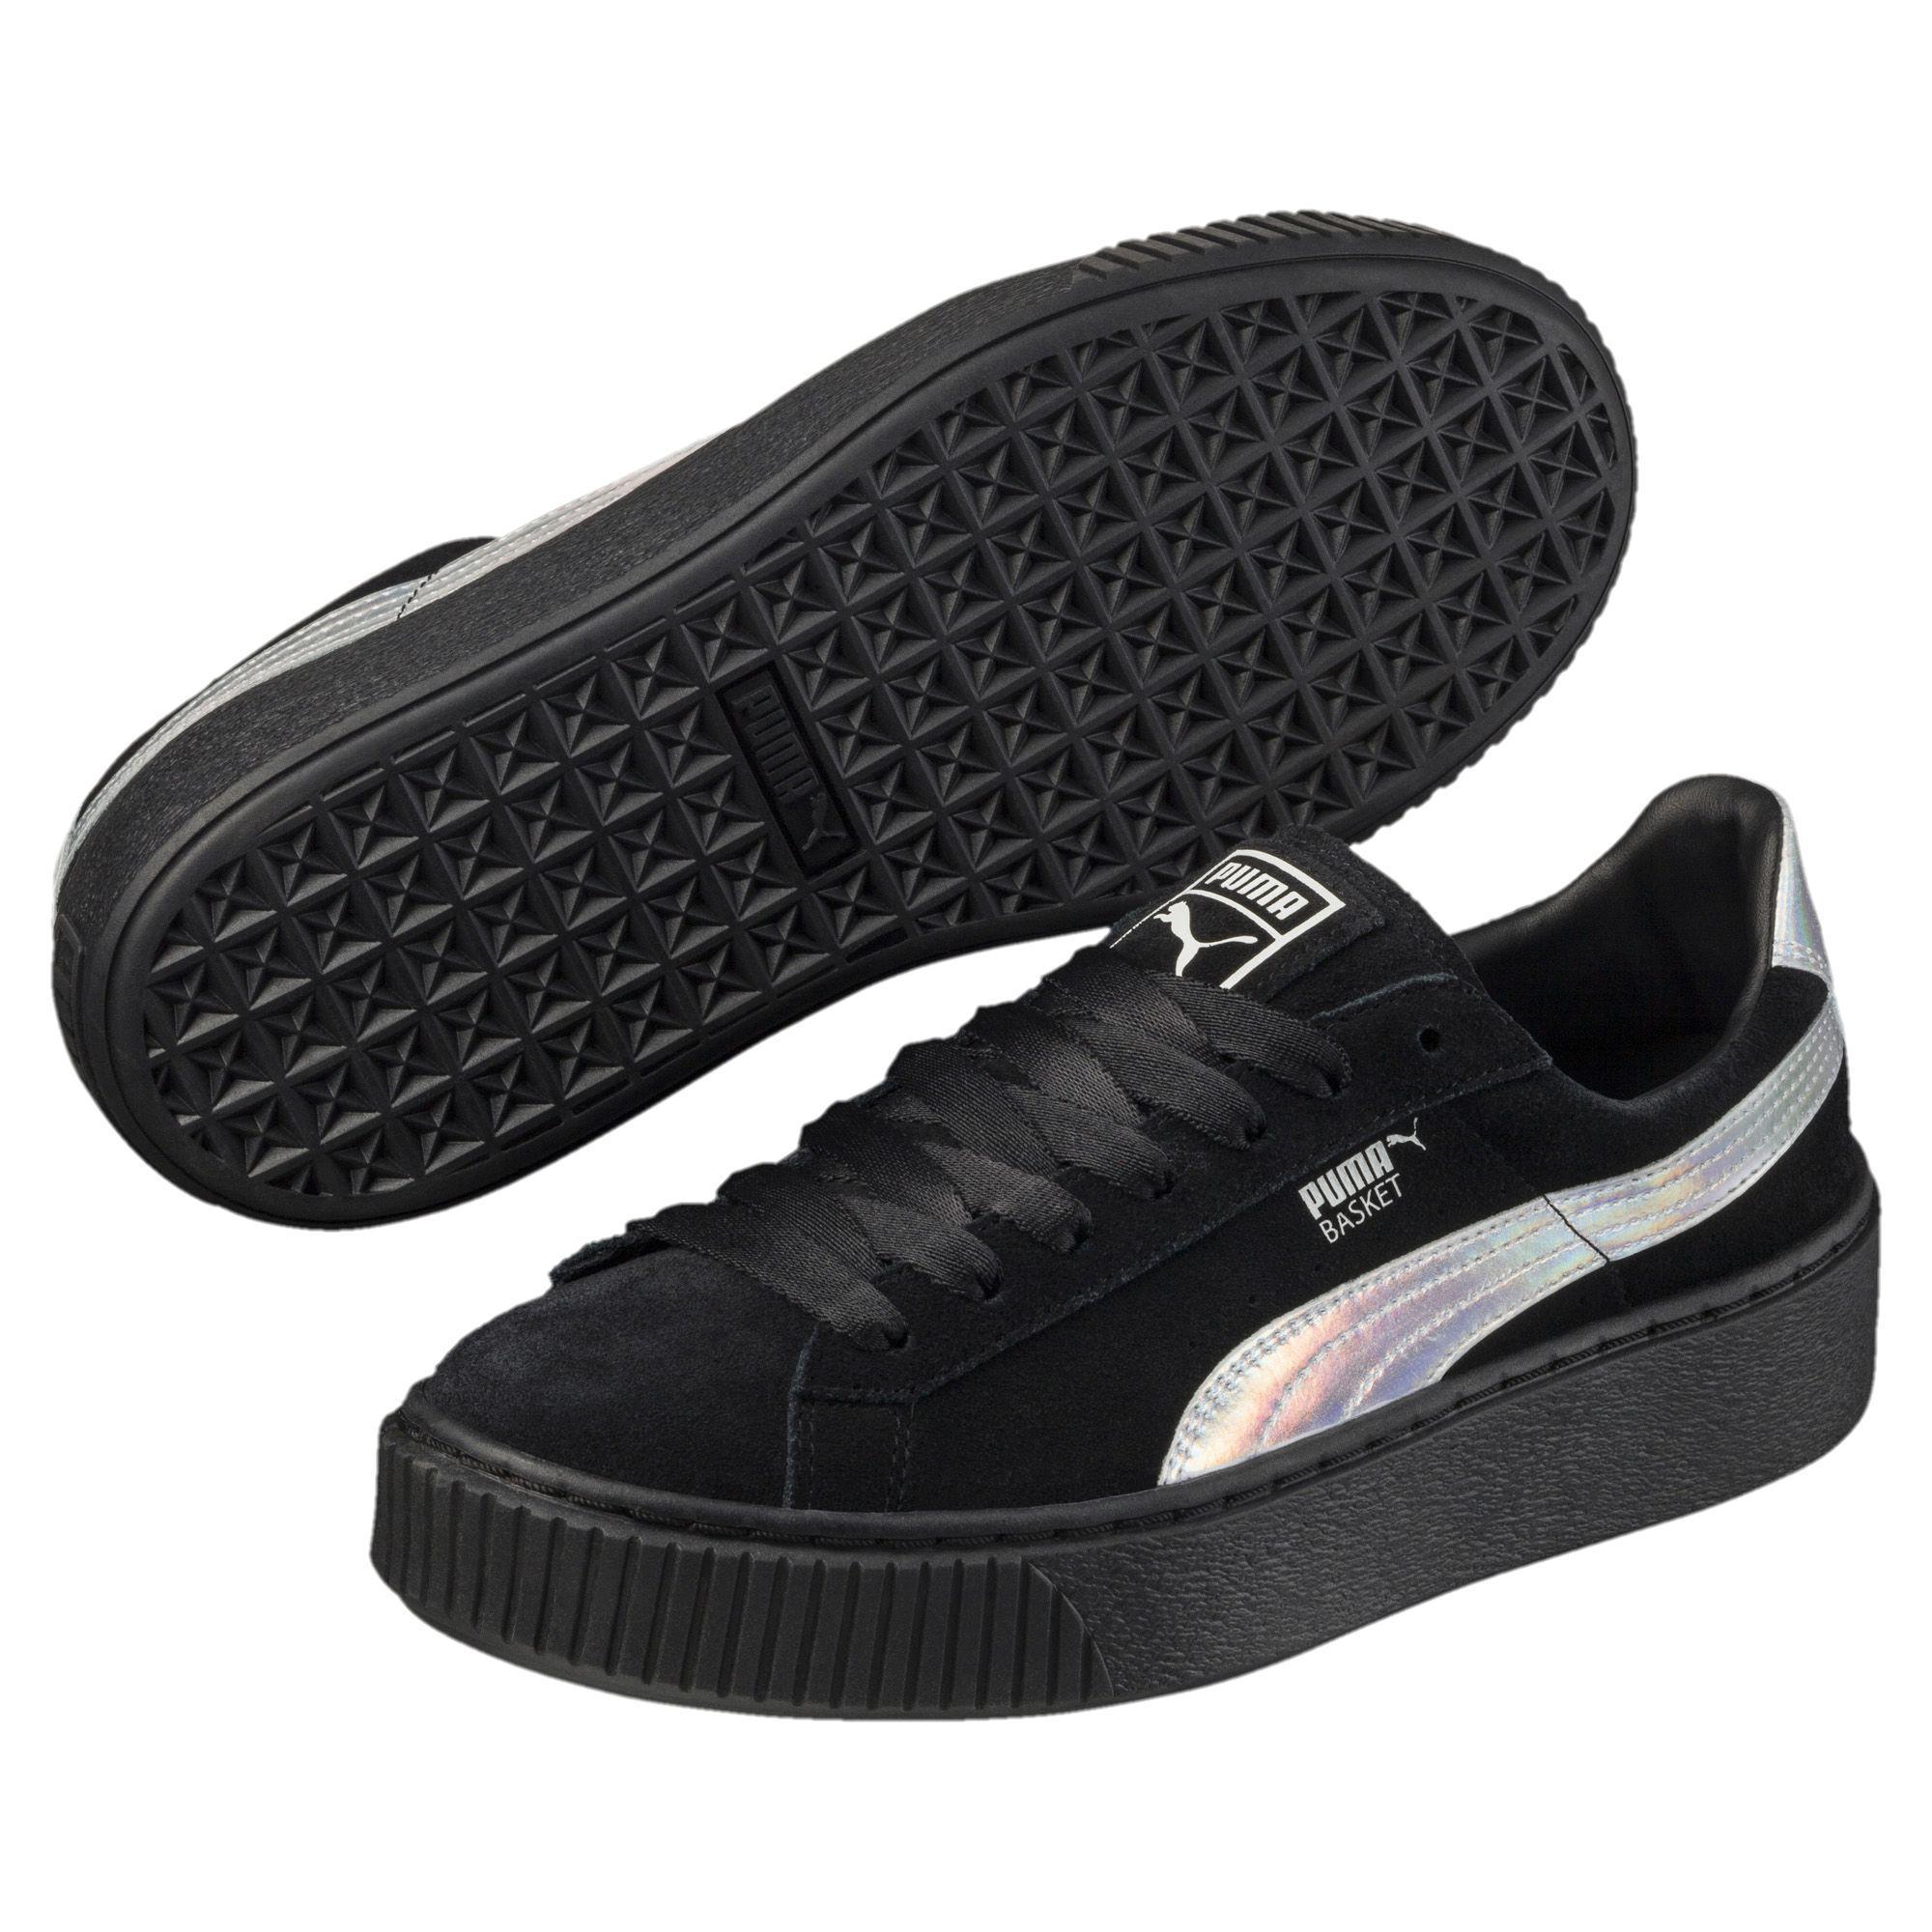 a7d569187fb7 Lyst - PUMA Suede Platform Explosive Women s Sneakers in Black